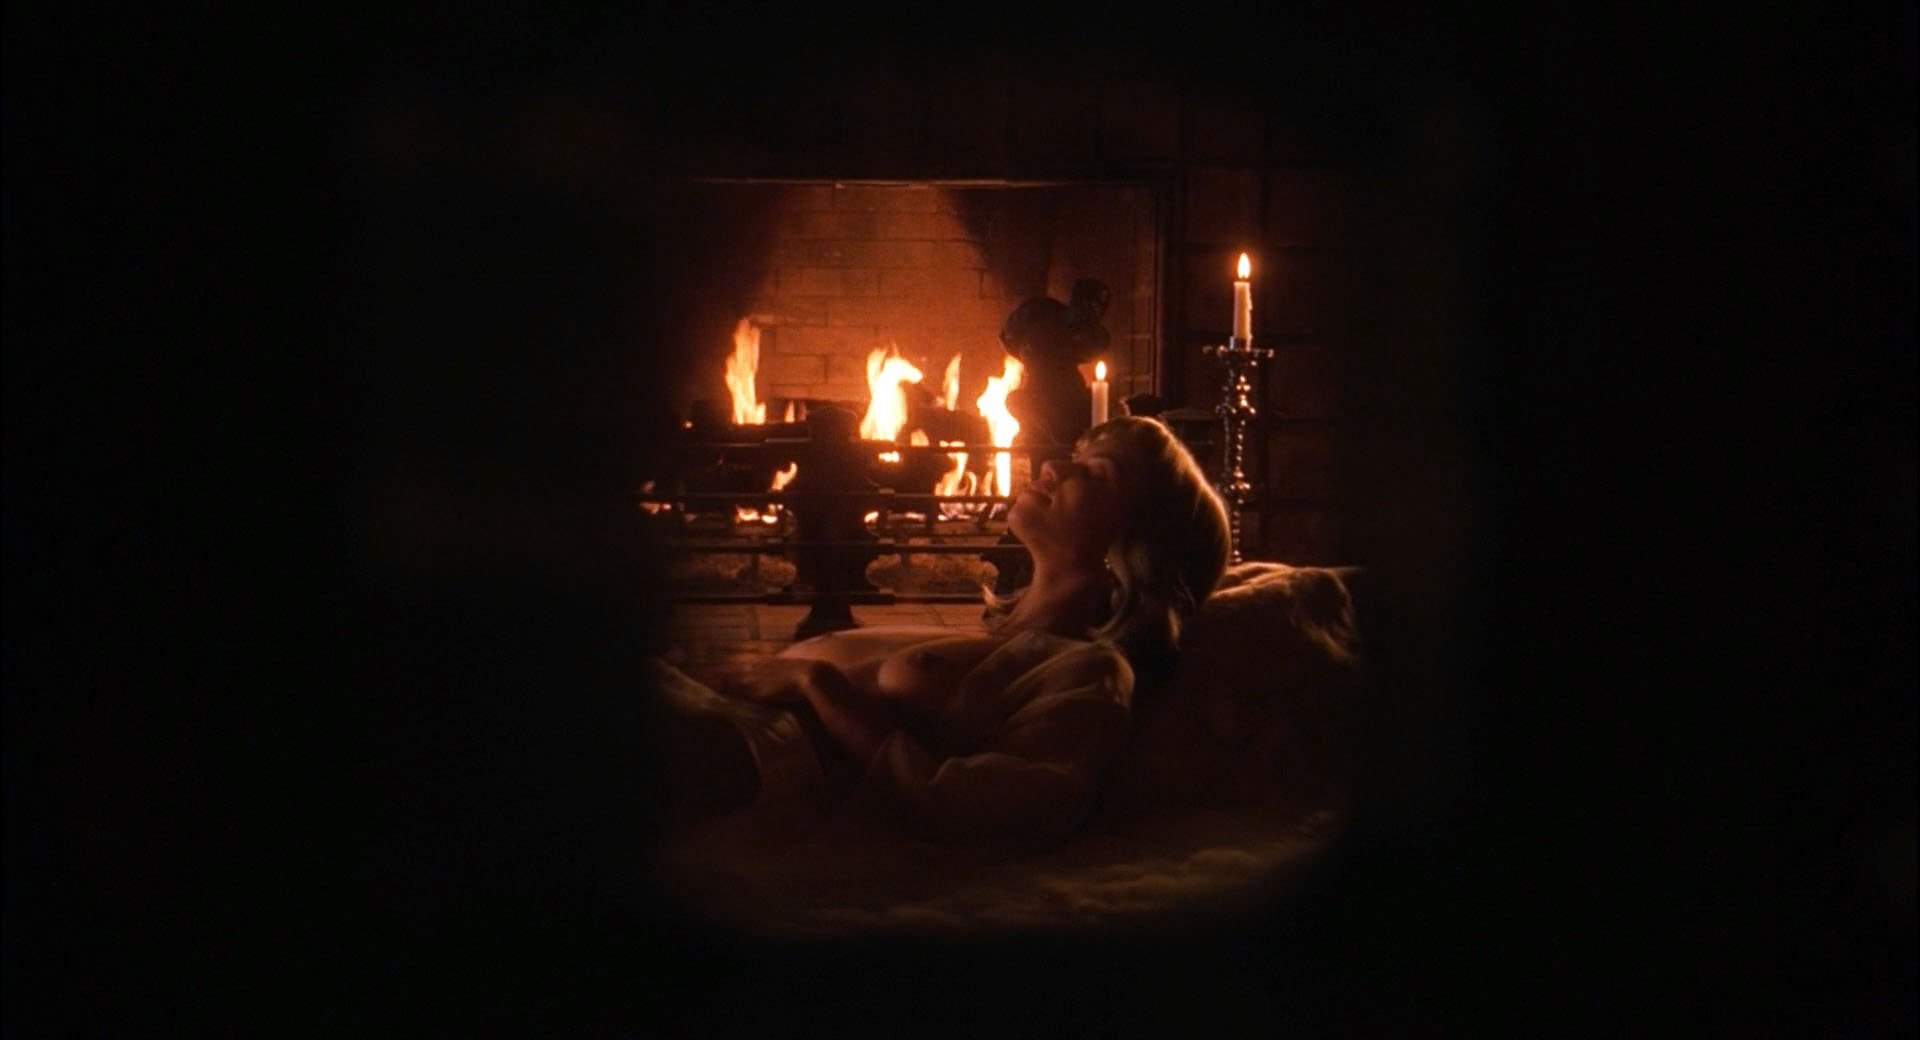 Gloria Reuben nude - Wild Orchid 2 (1991)